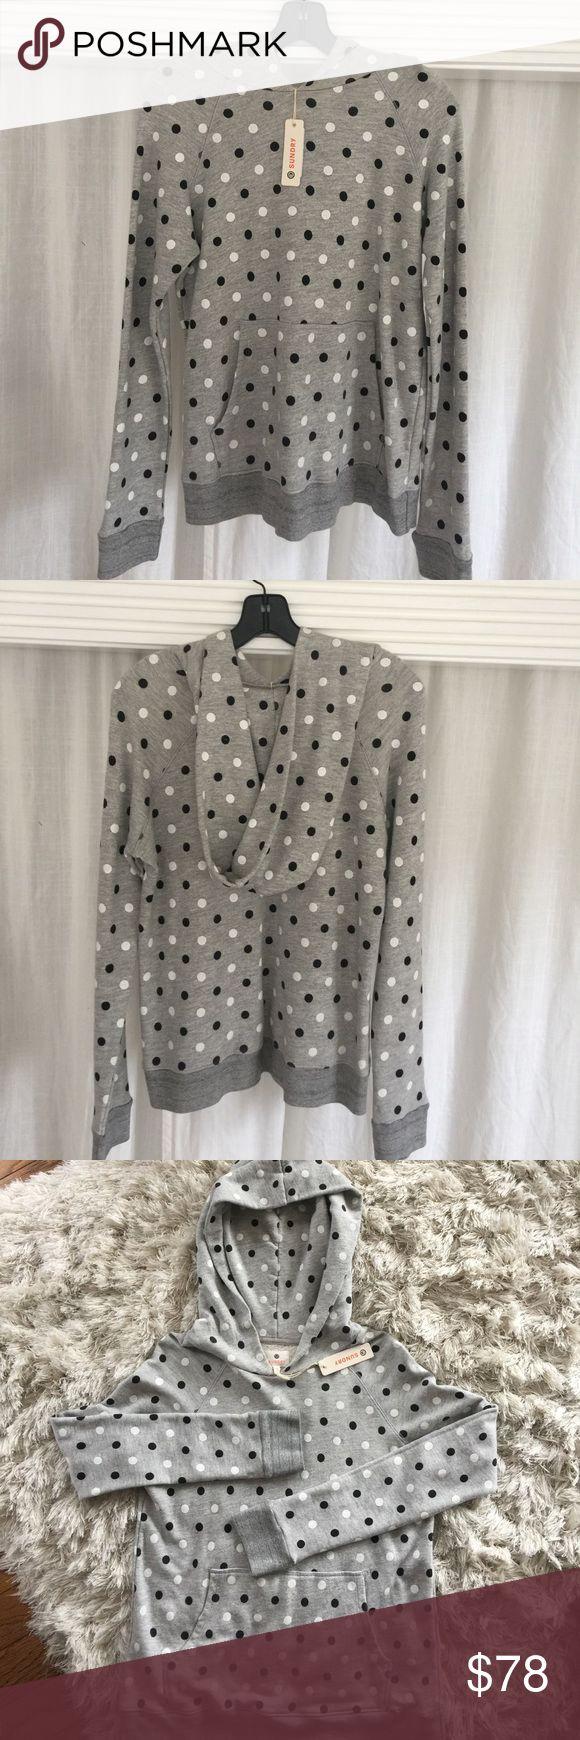 NWT sundry polka dot hoodie size small NWT polkadot sundry Hoodie size 1 (small) grey hoodie with black and white polka dots. Anthropologie Tops Sweatshirts & Hoodies